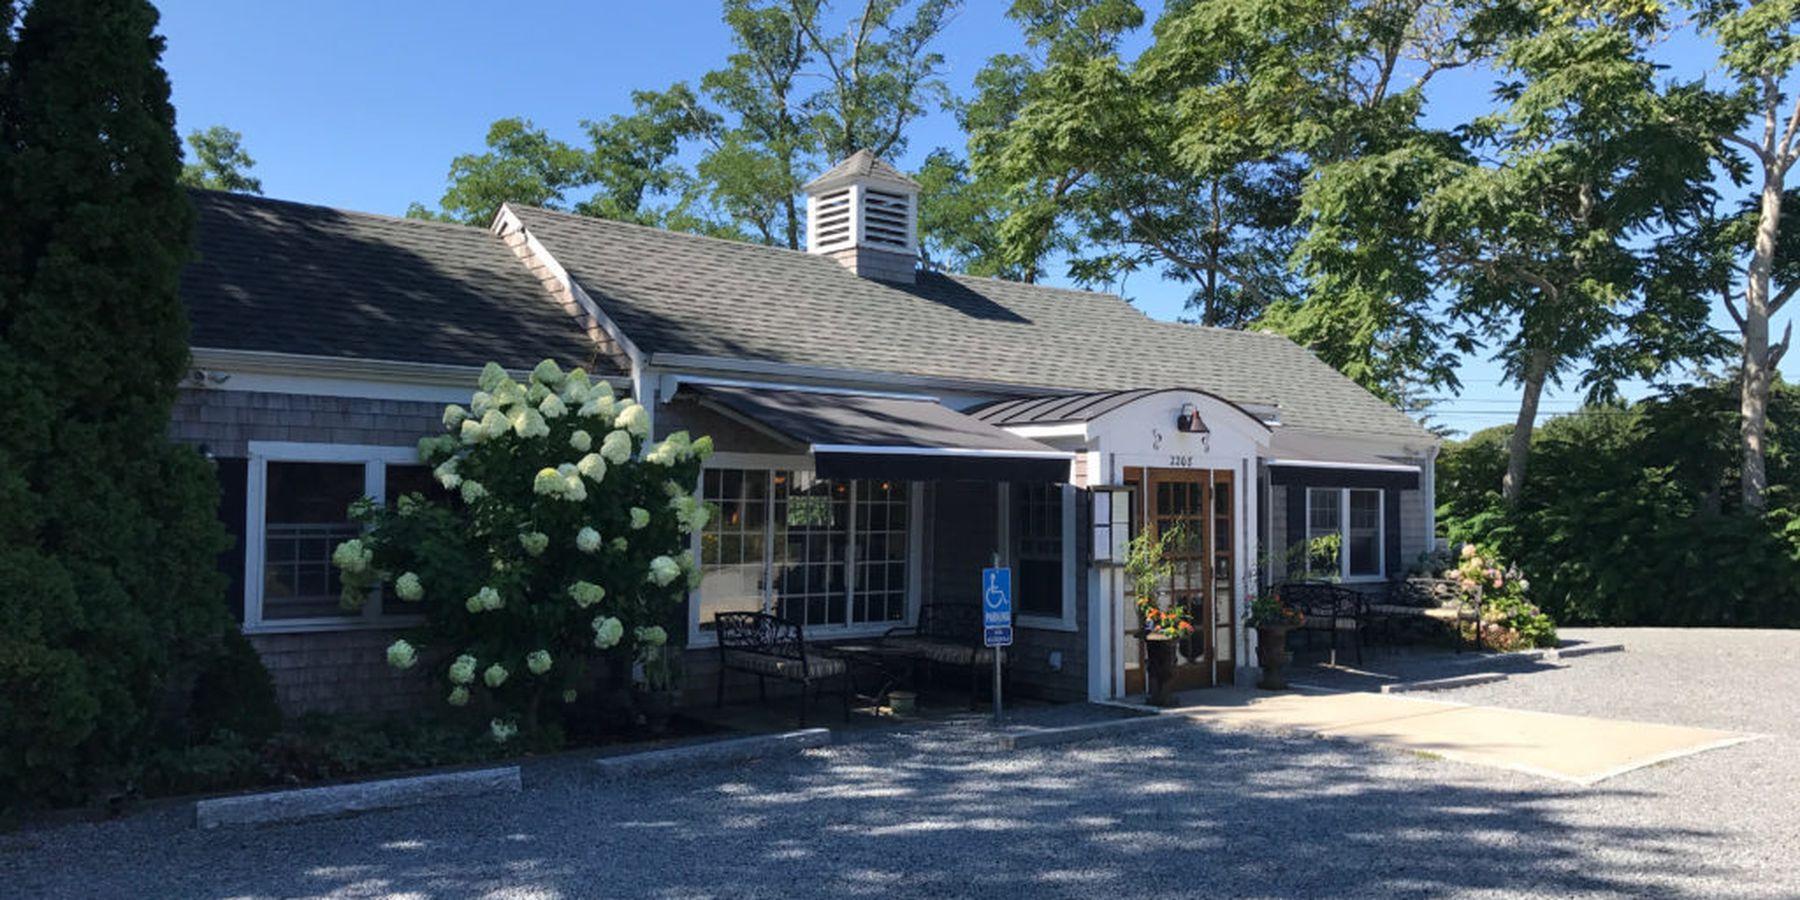 Brewster Fish House - Cape Cod - Massachusetts - Doets Reizen